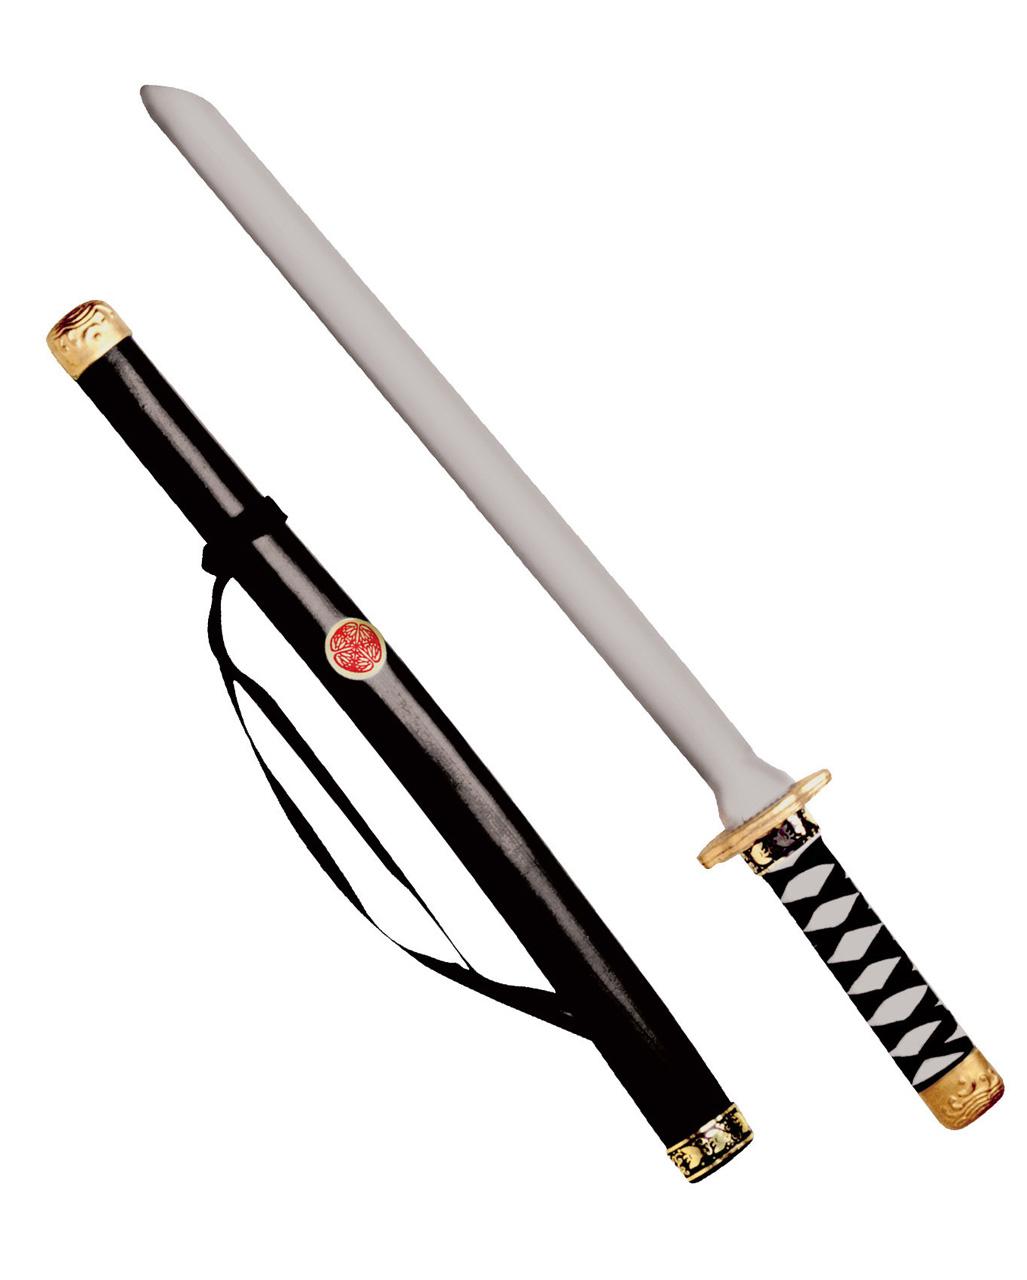 Ninja Samuraj Schwert Mit Scheide 60 Cm Karneval Horror Shop Com